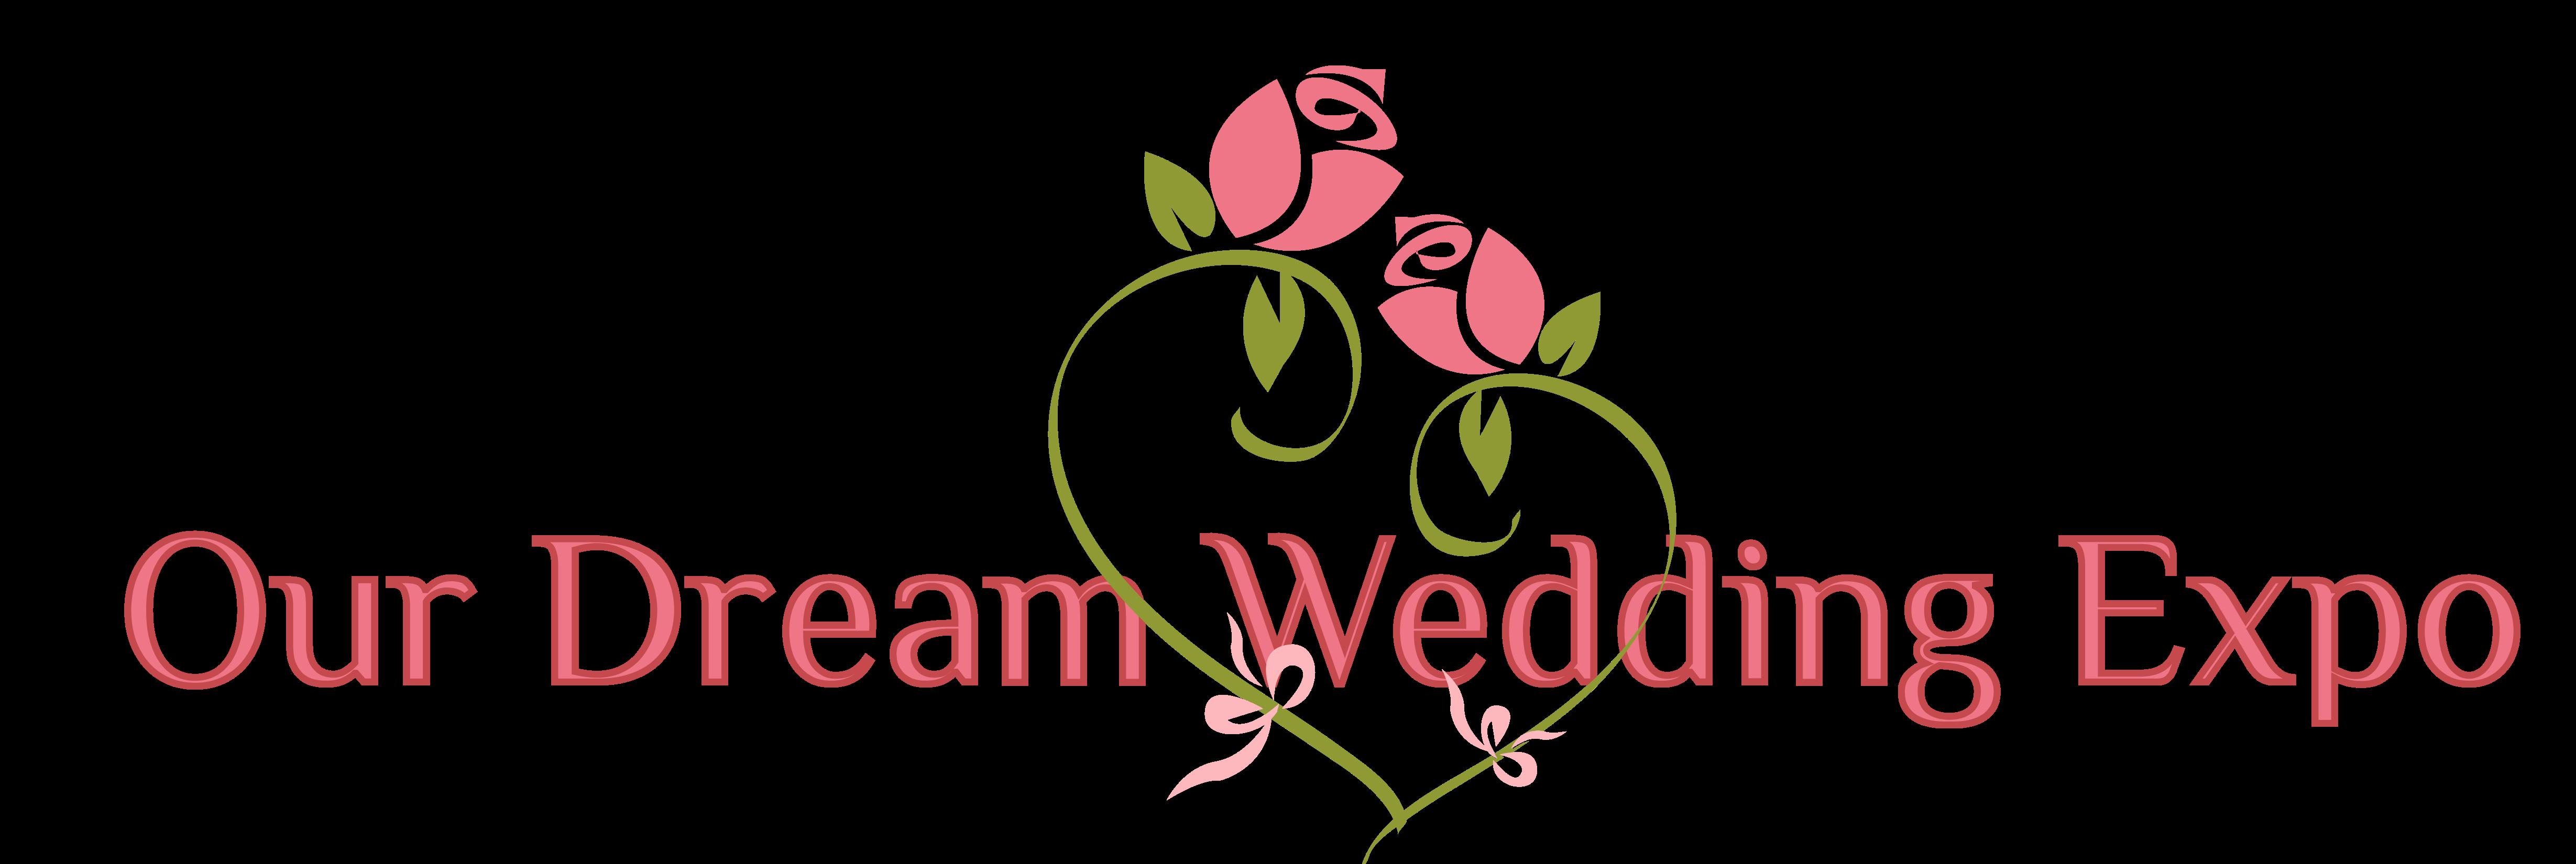 Our Dream Wedding Expo